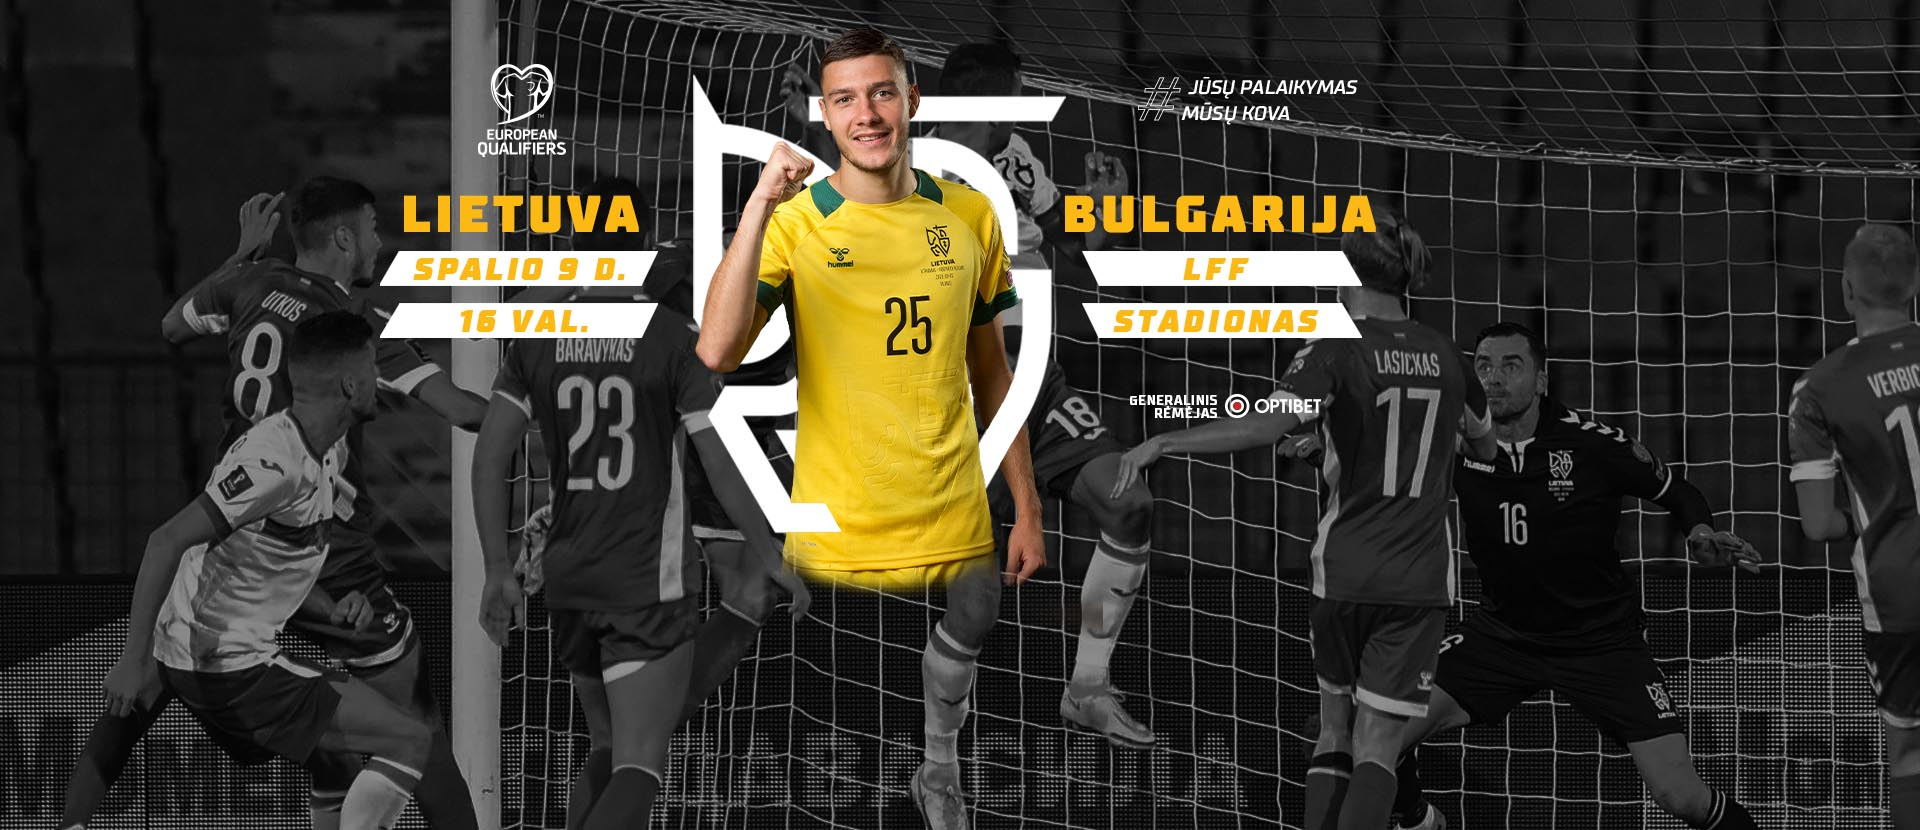 2022 m. FIFA Pasaulio vyrų futbolo čempionato atranka: LIETUVA – BULGARIJA